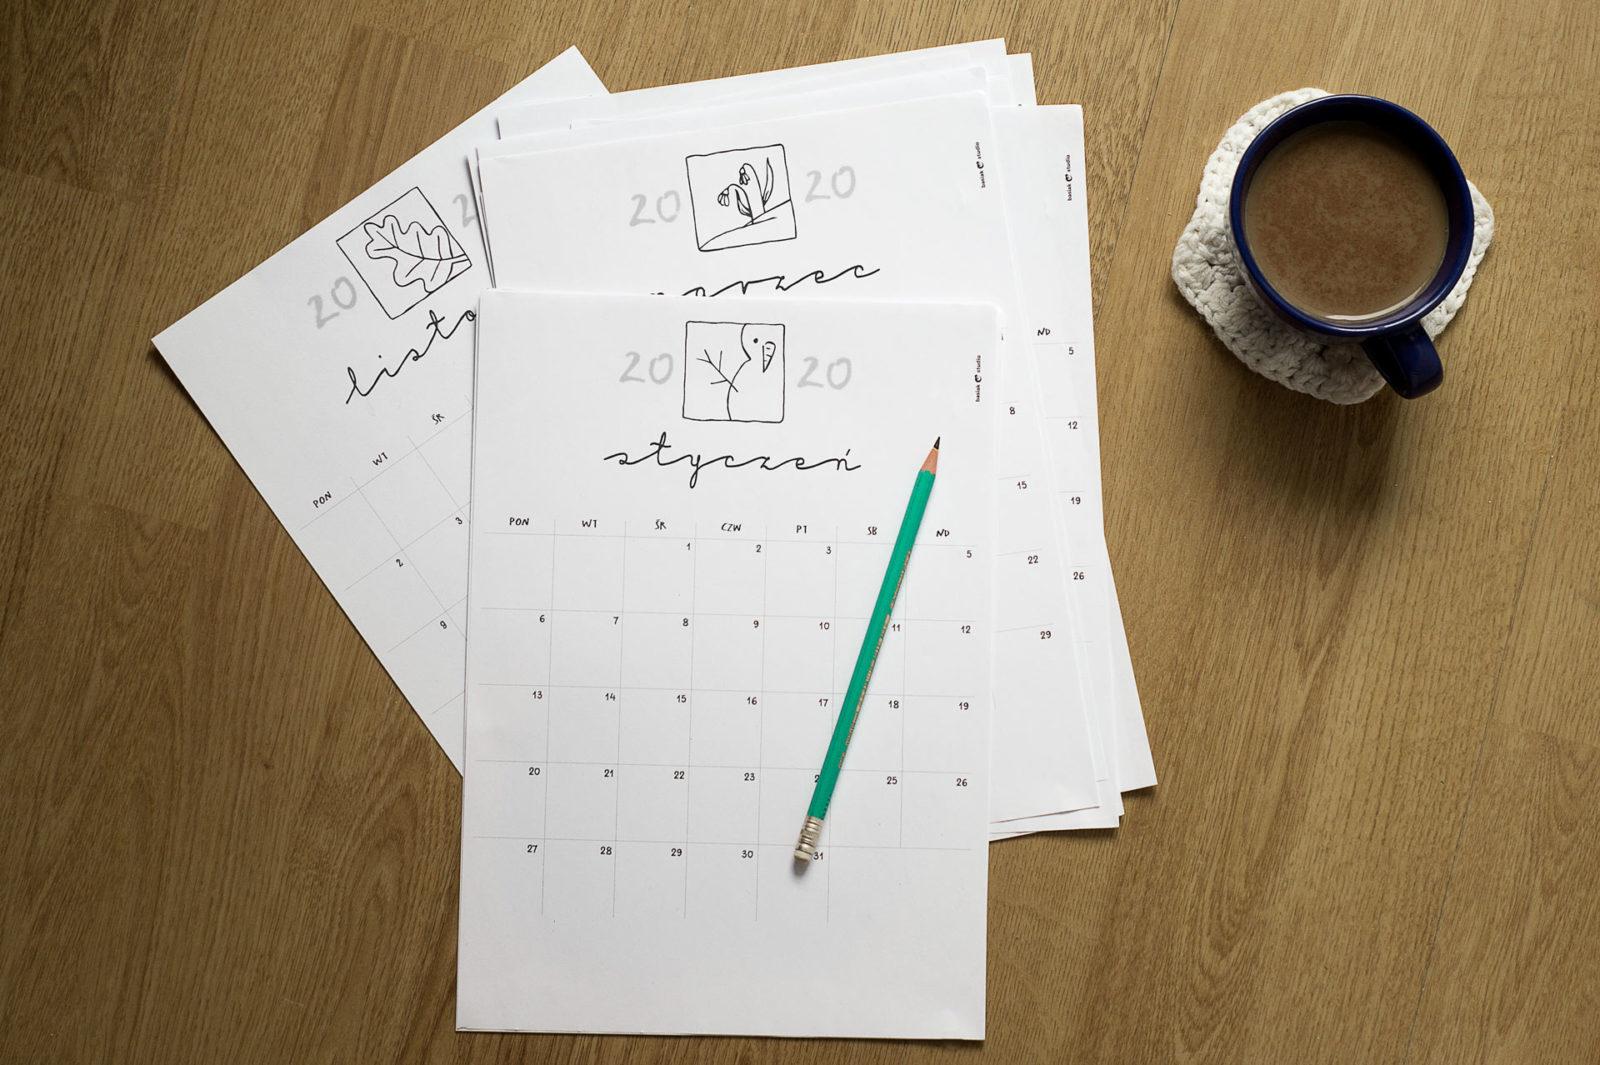 prosty i funkcjonalny kalendarz do druku na drukarce, na rok 2020